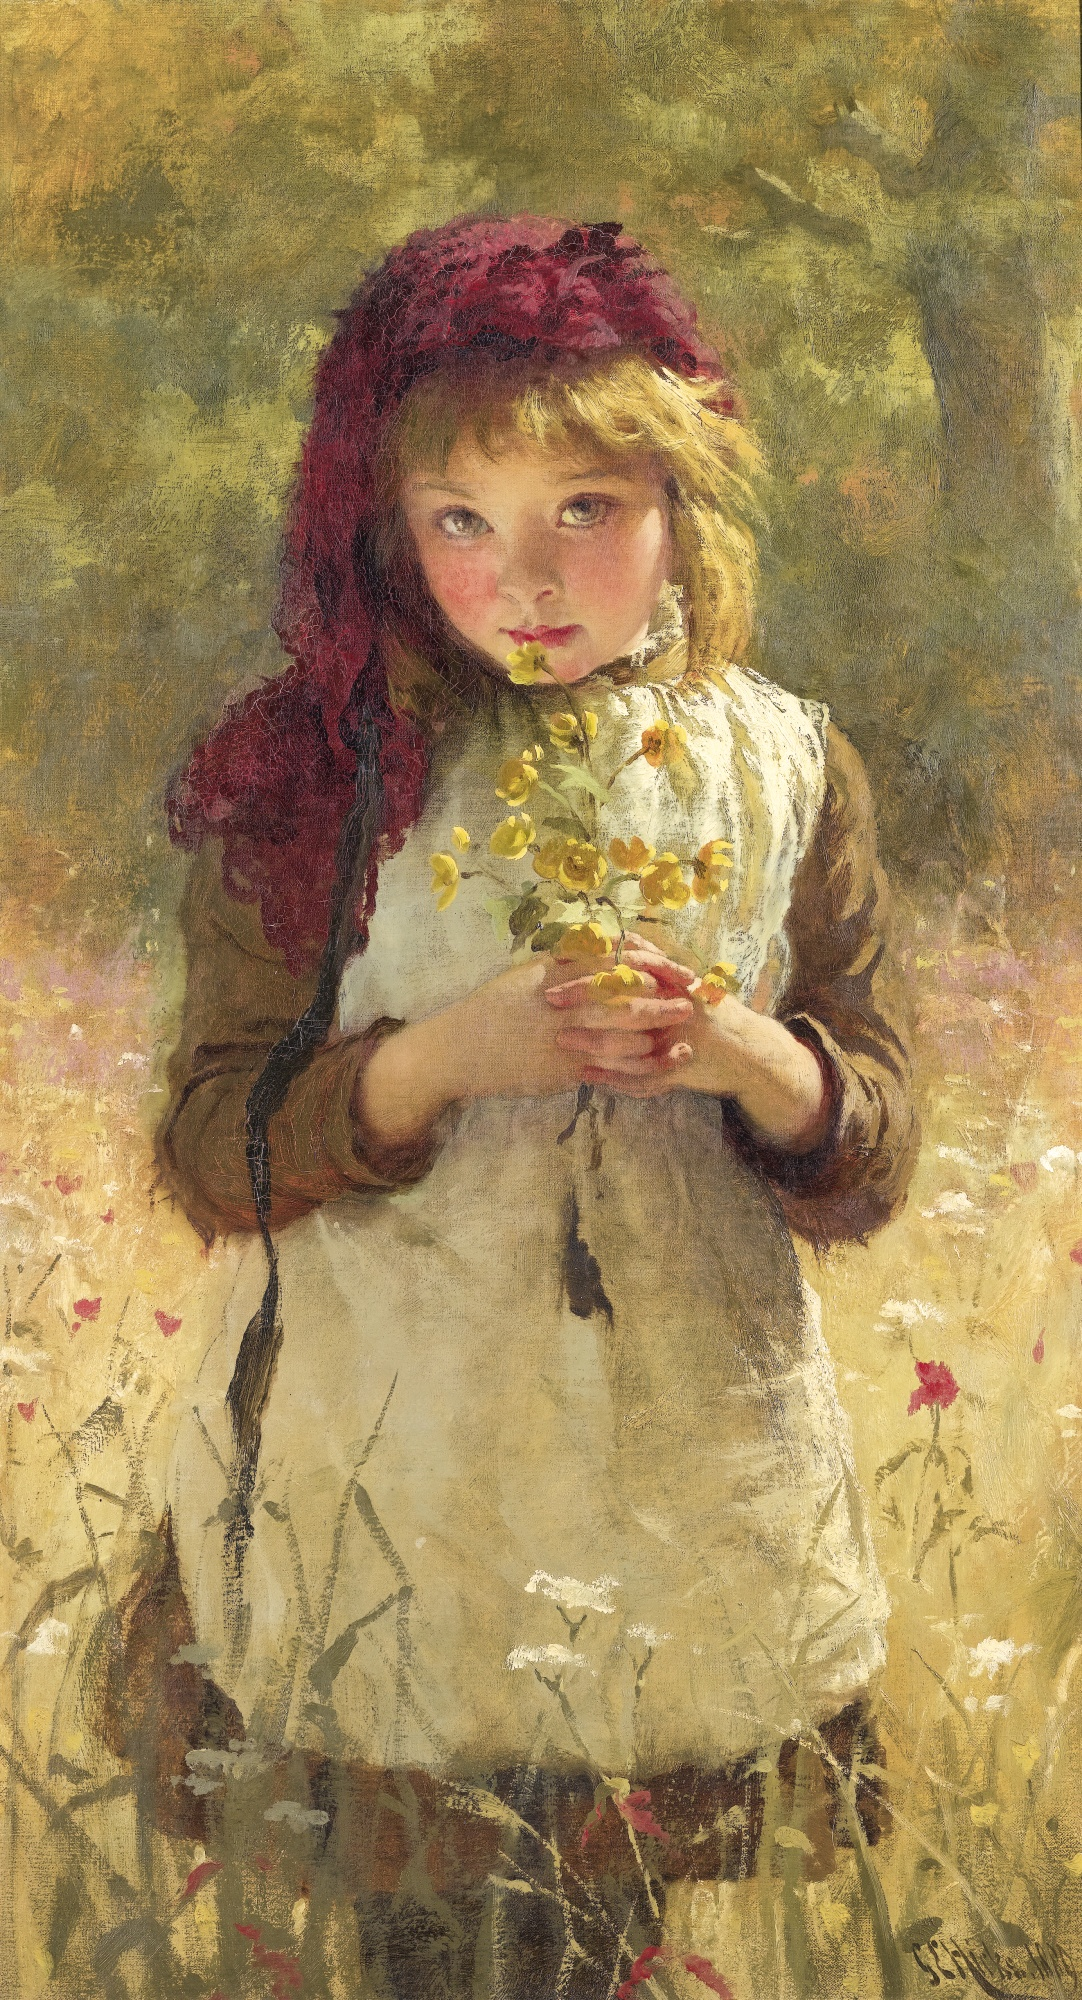 George_Elgar_Hicks_-_Buttercups